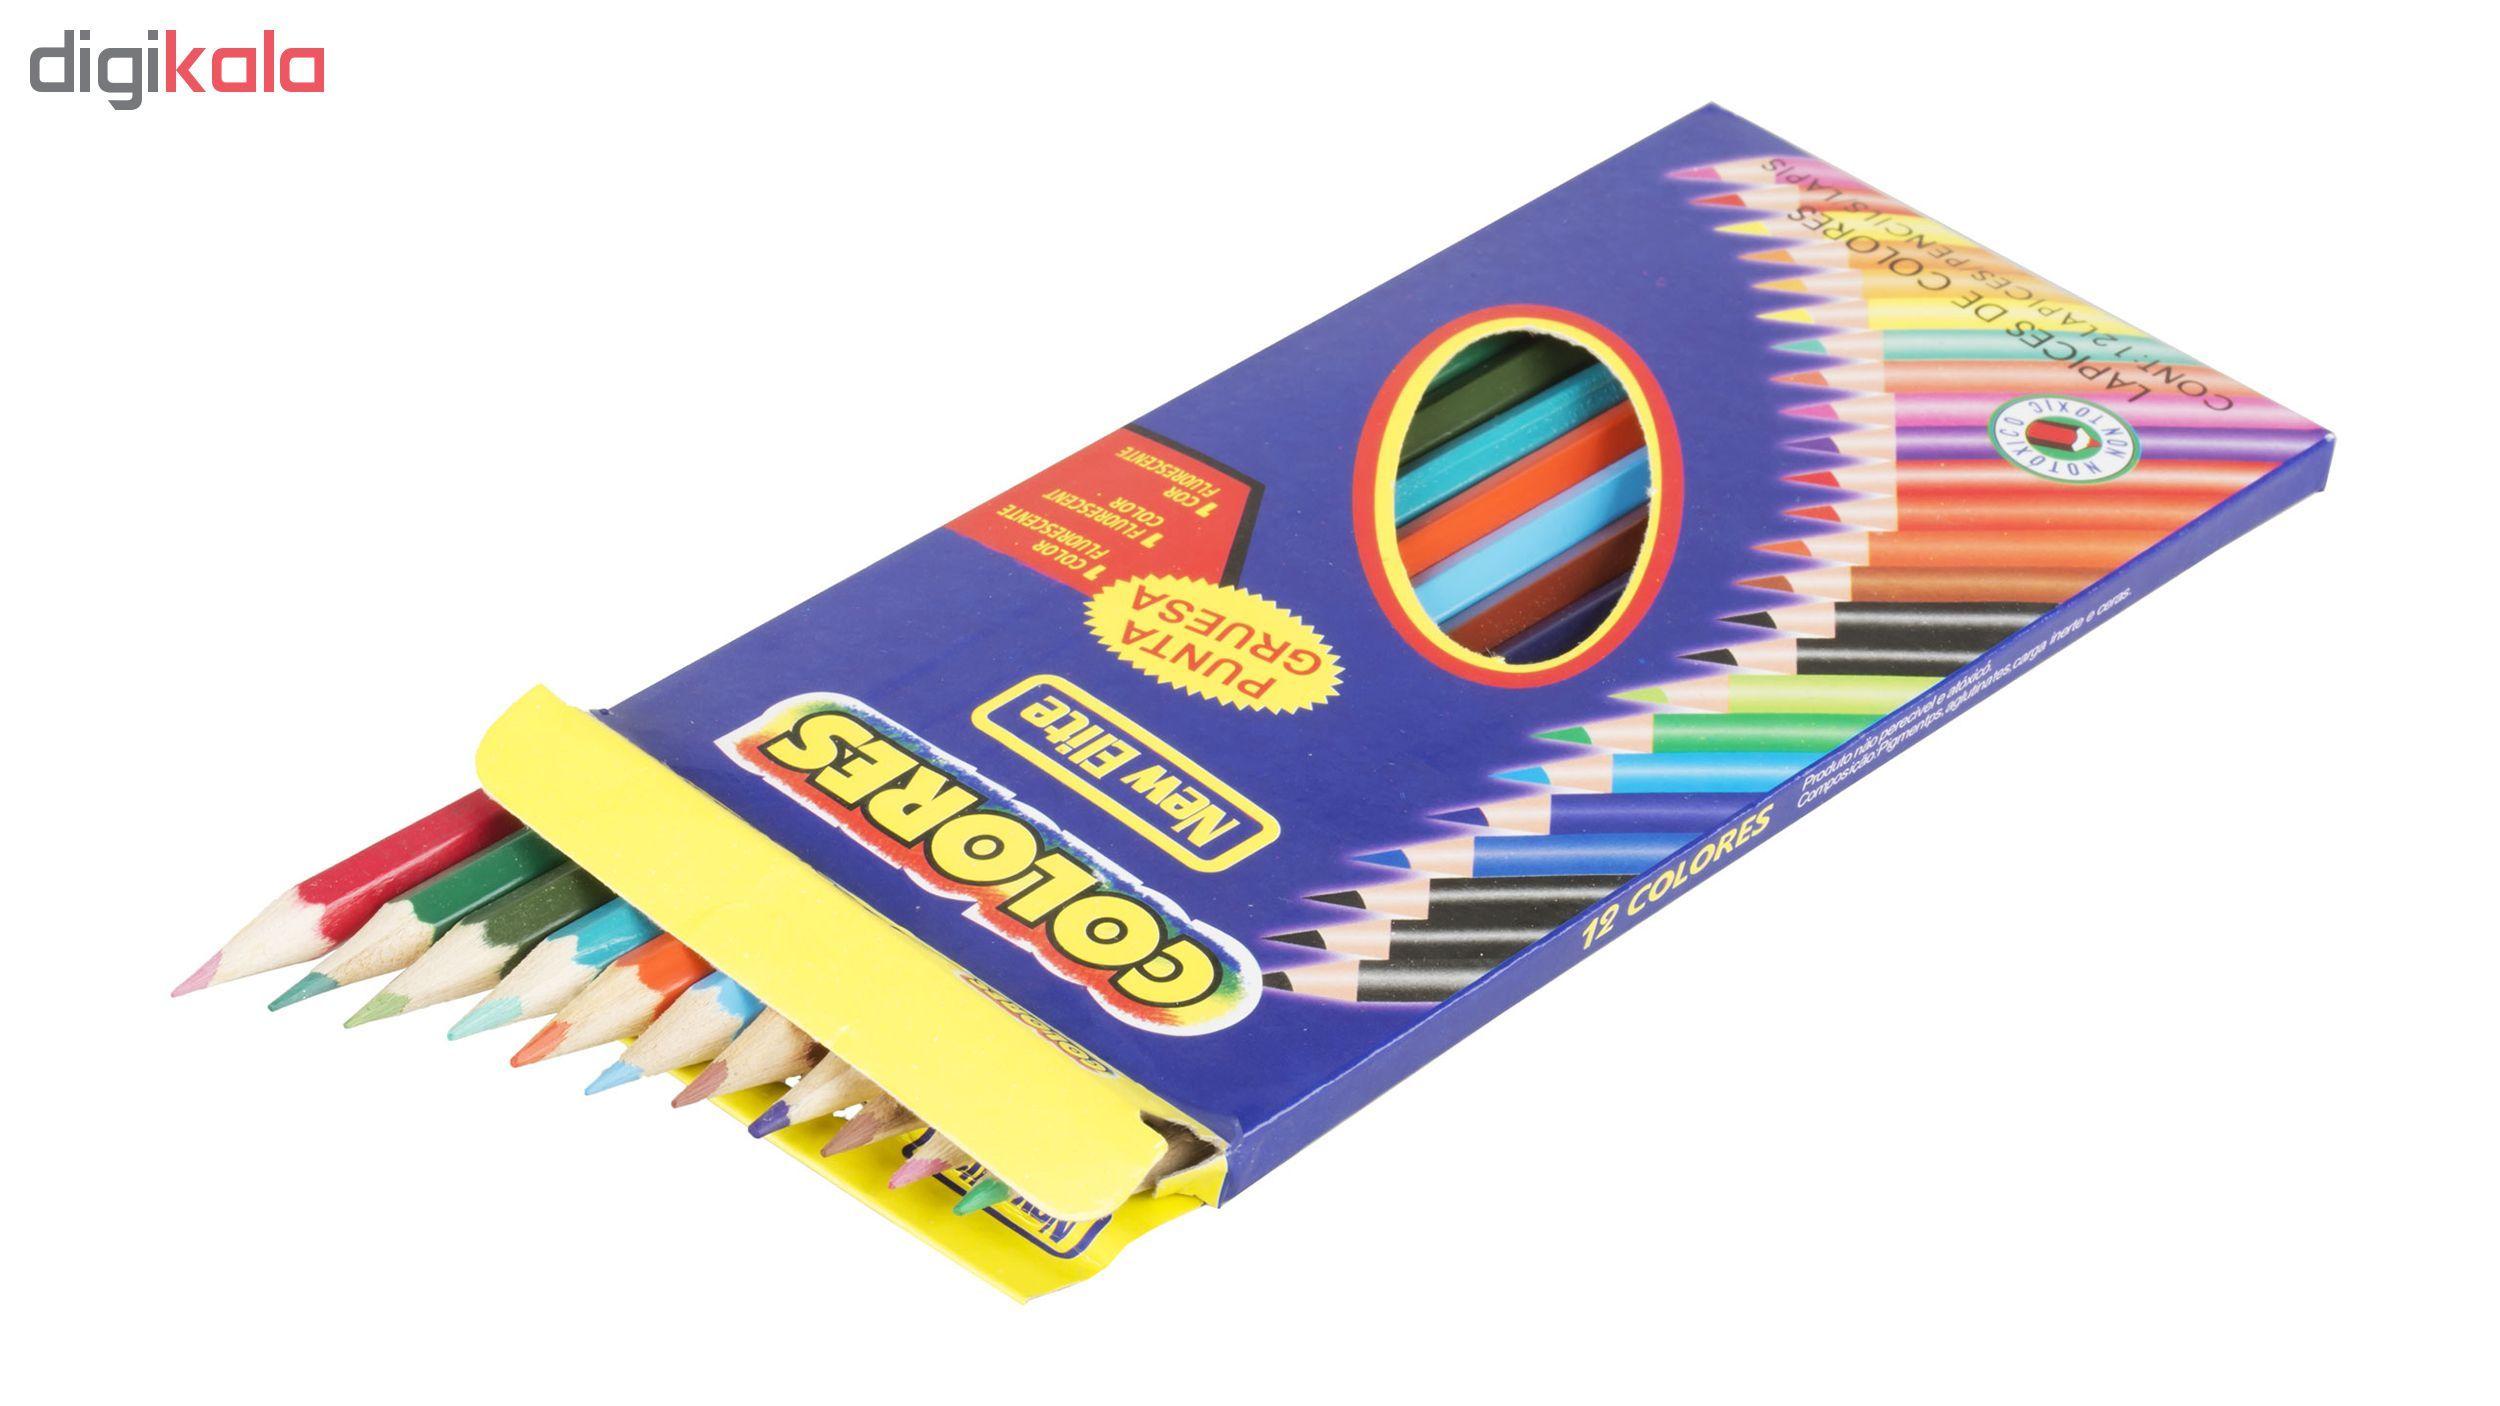 مداد رنگی 12 رنگ نیو الیت مدل Colores main 1 3